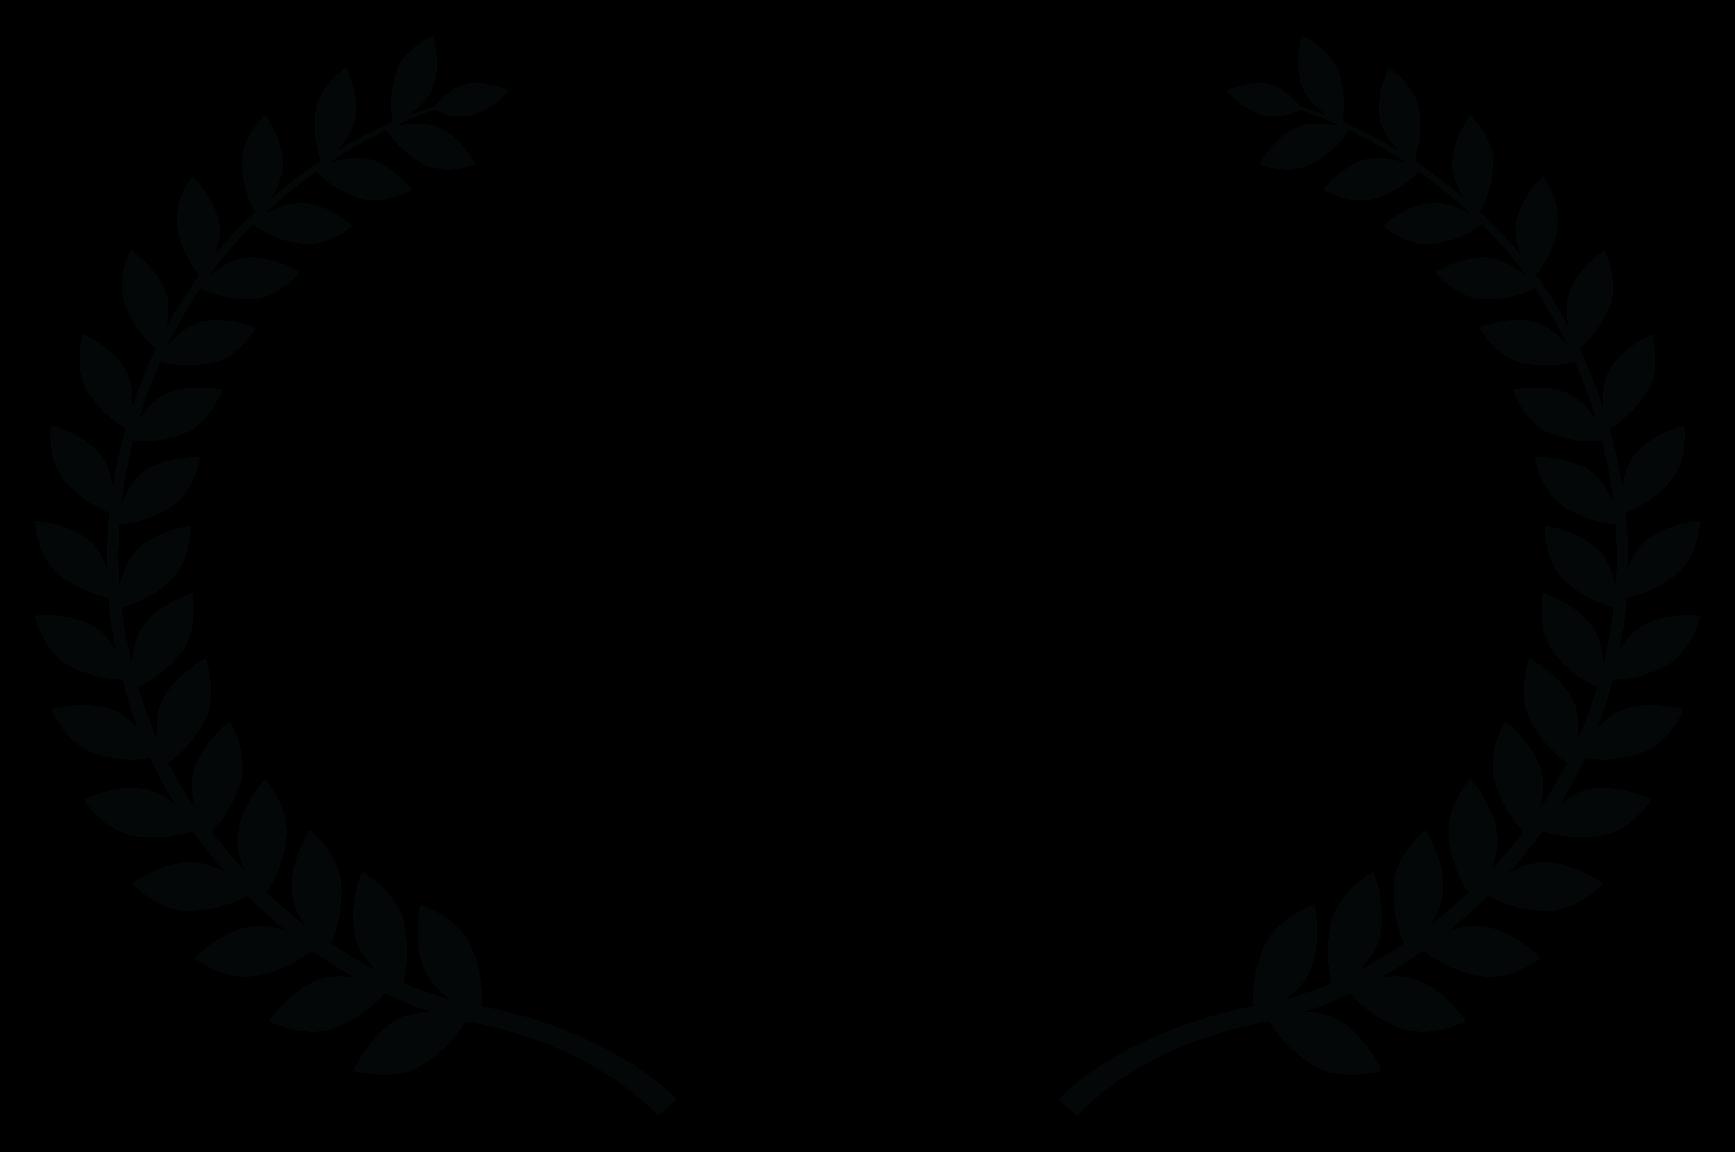 WINNER - World Distribution Award DISTRIBUTE YOUR FILM - 2021